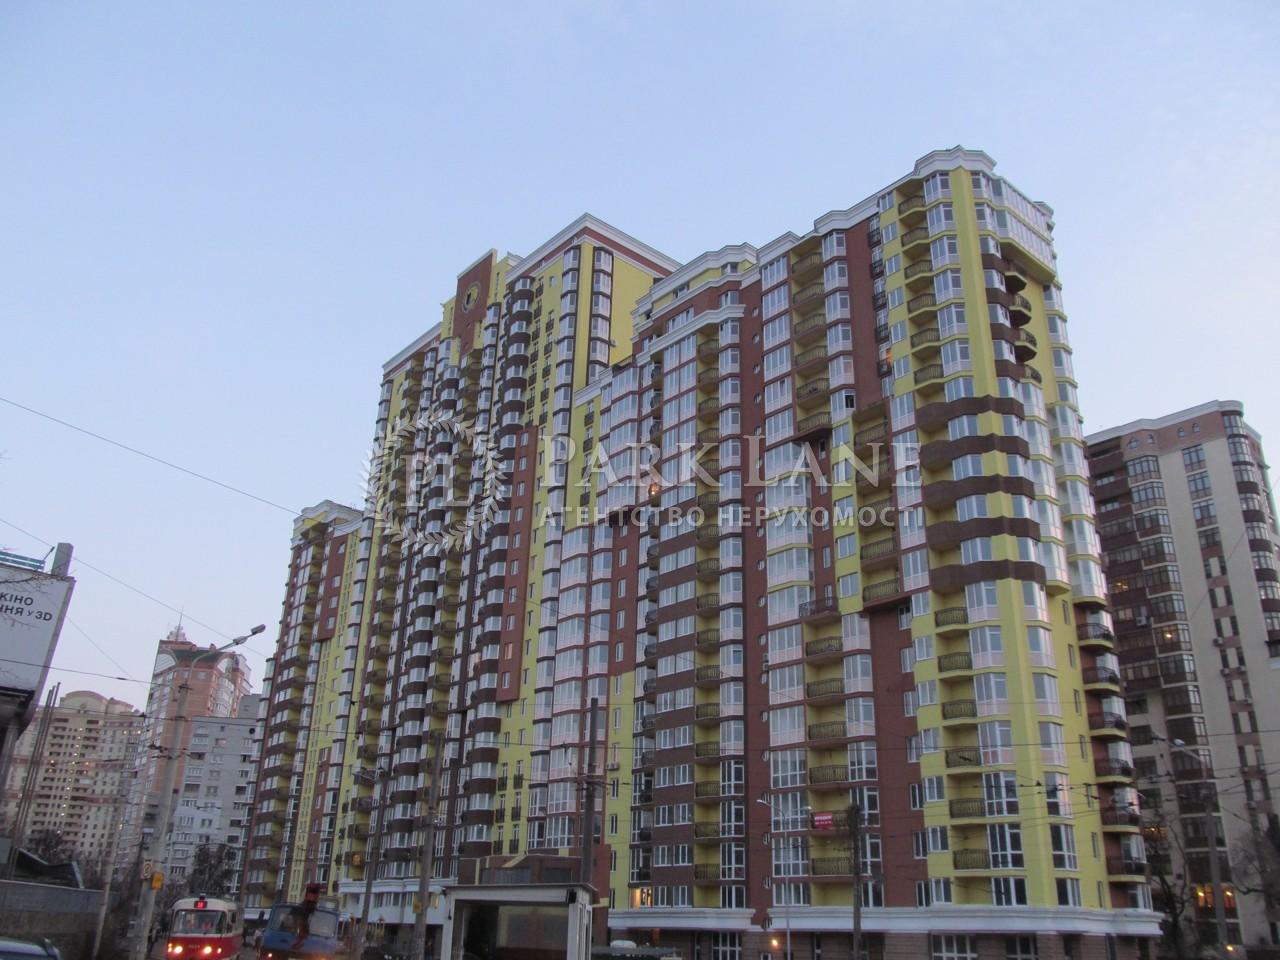 Квартира ул. Коперника, 3, Киев, K-26729 - Фото 13